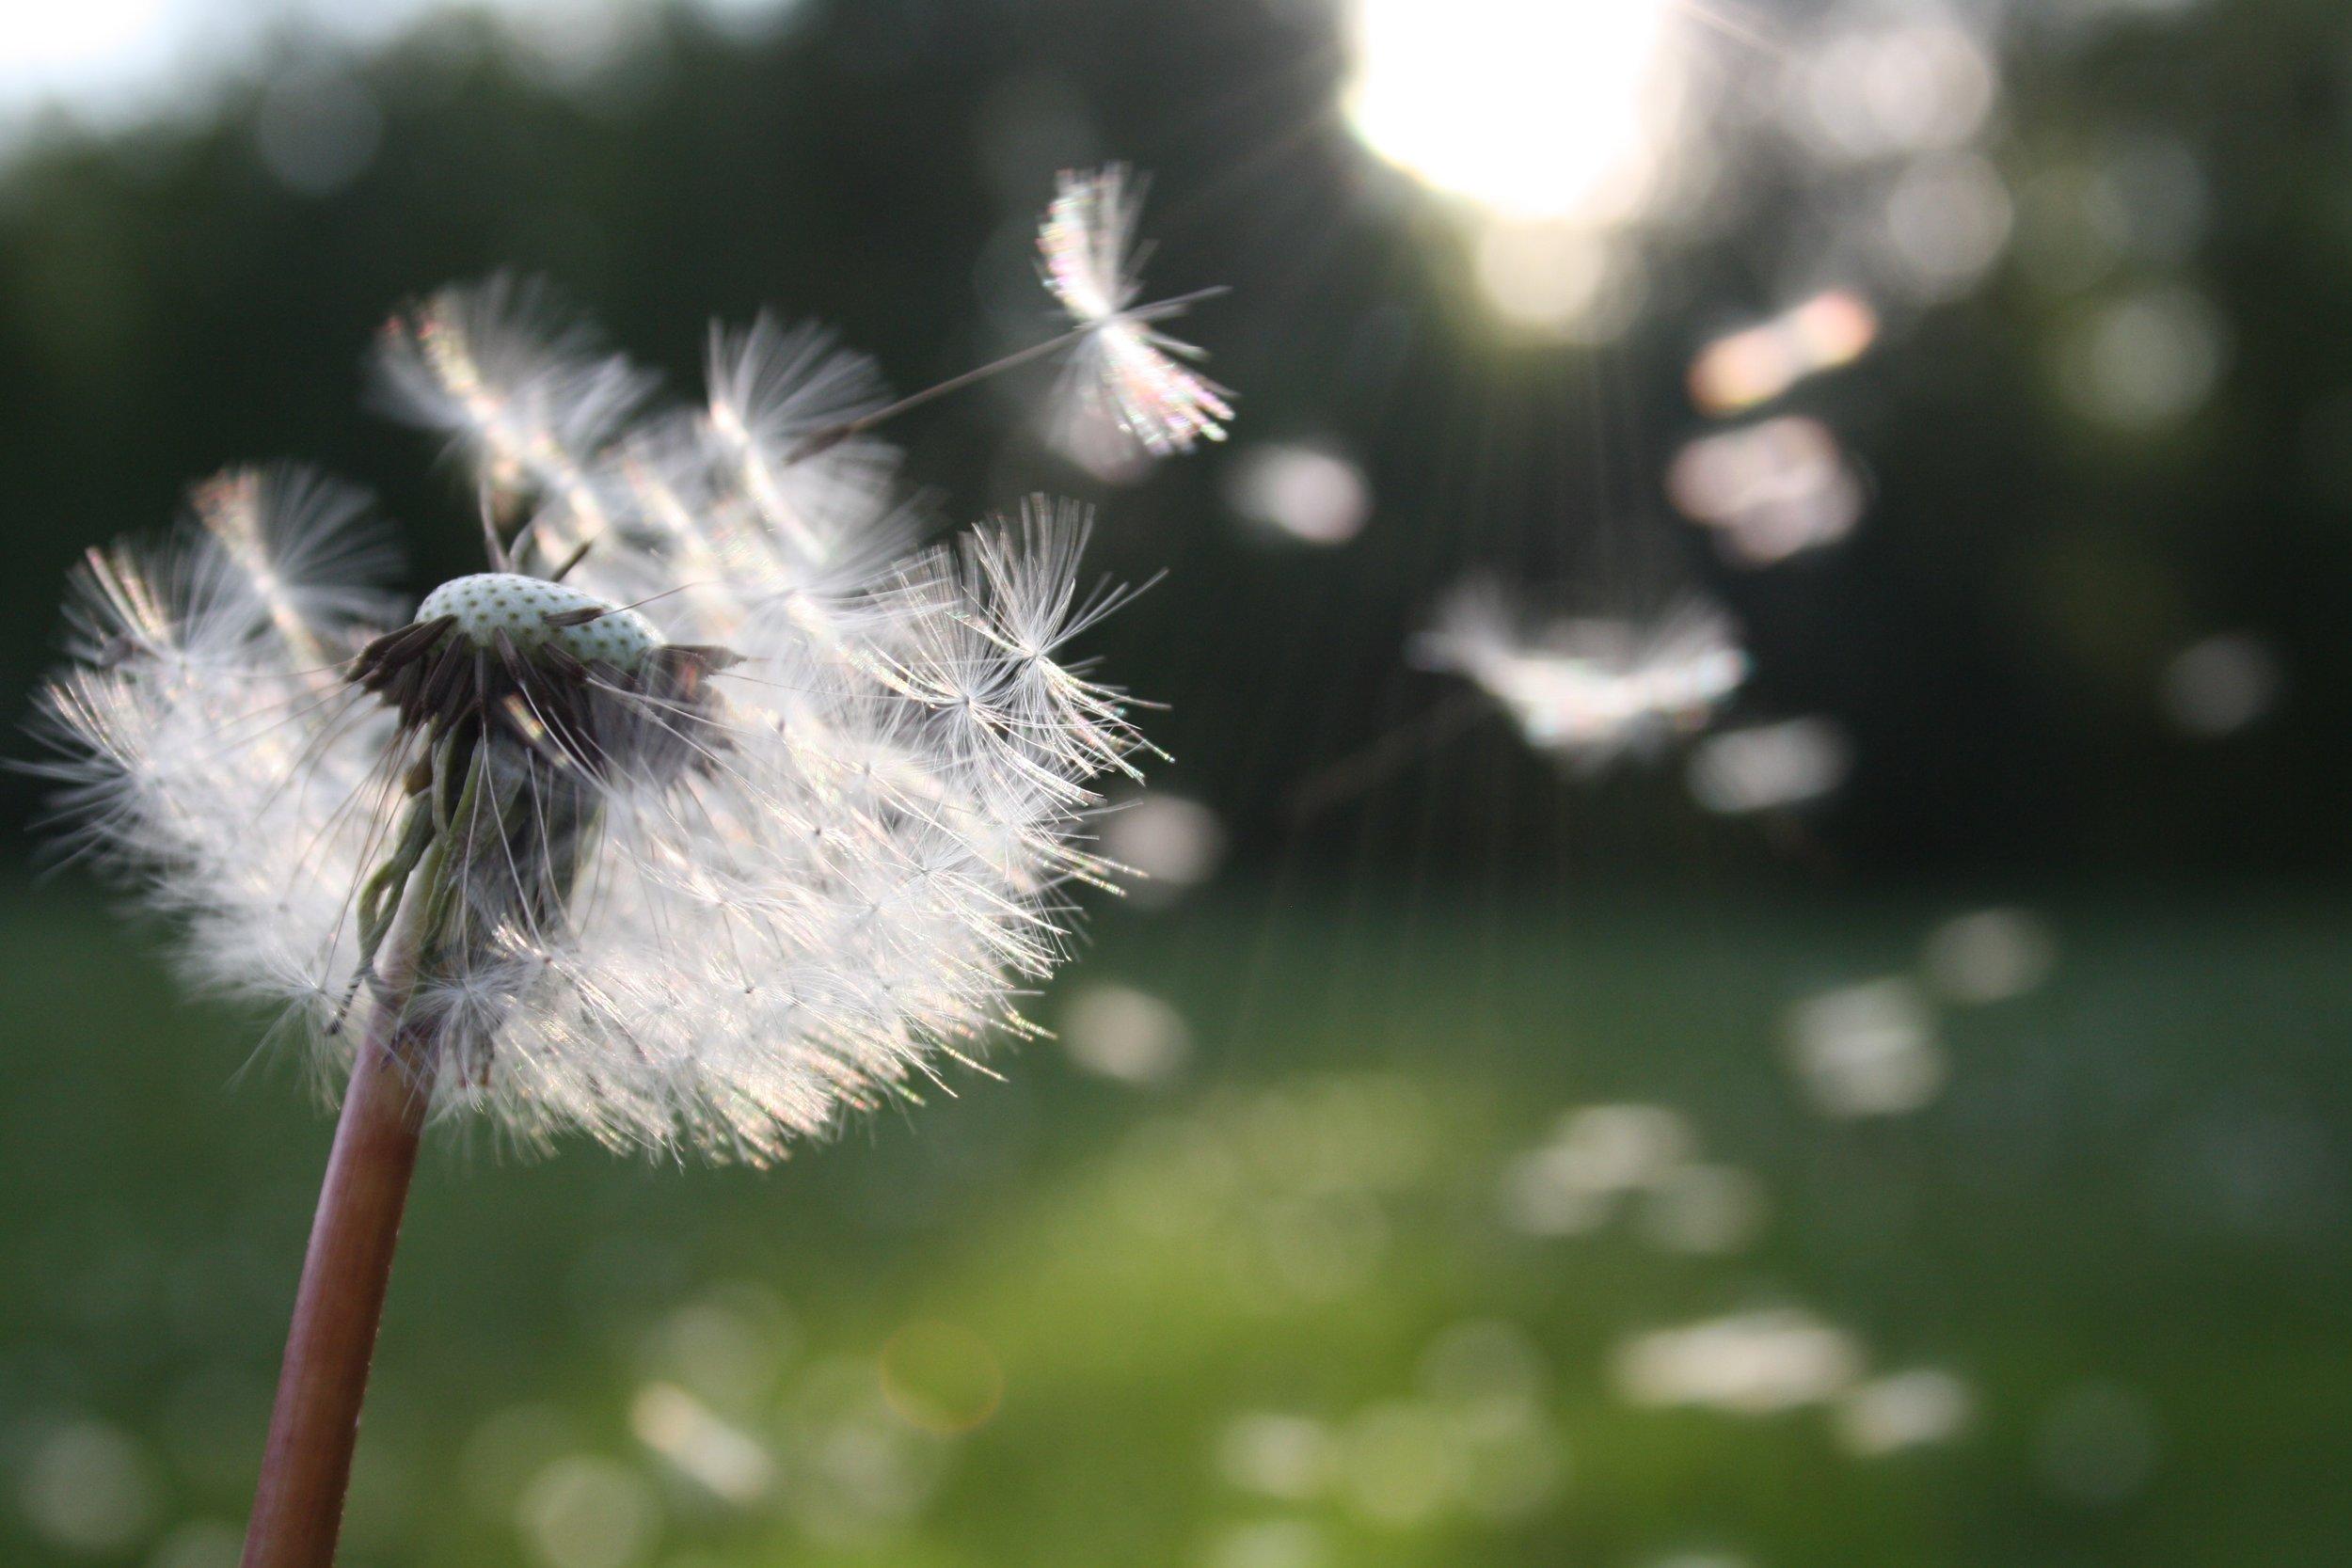 blowball-dandelion-dandelion-seed-54300 (1).jpg